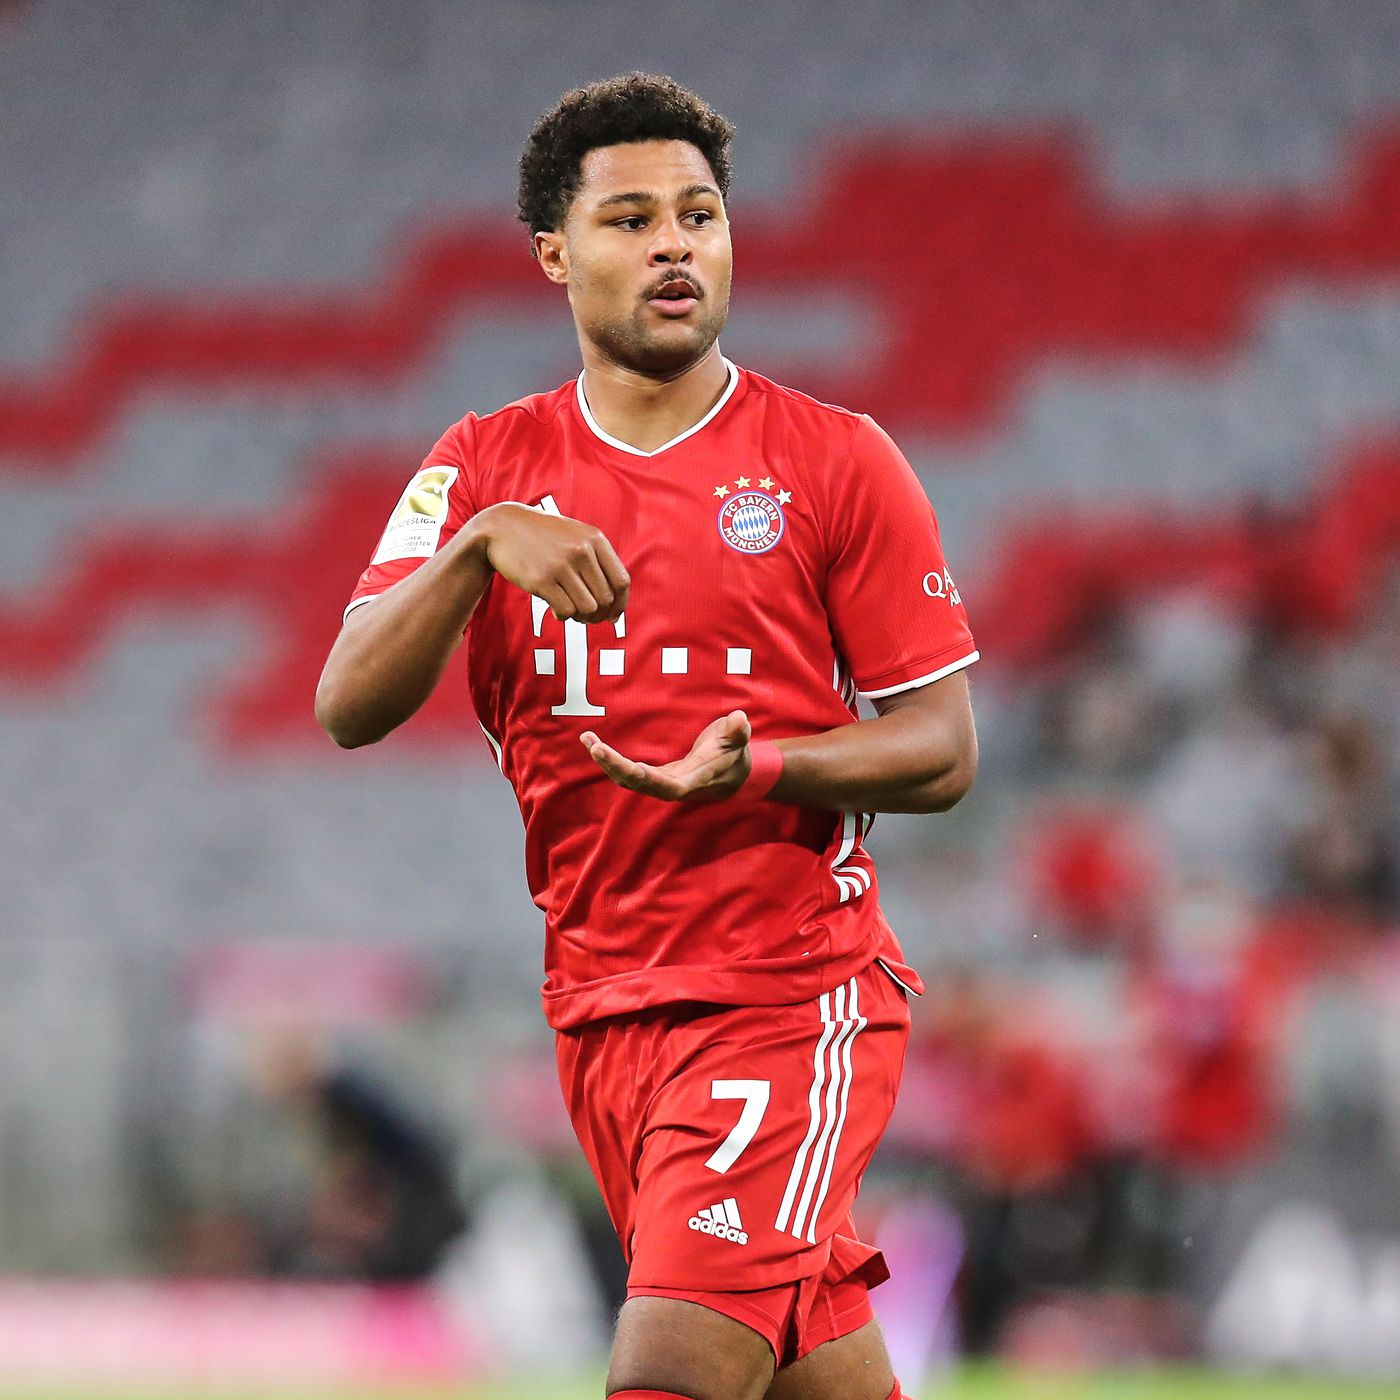 Bayern Munich S Quest For 102 Goals Matchday 1 Comparison Bavarian Football Works